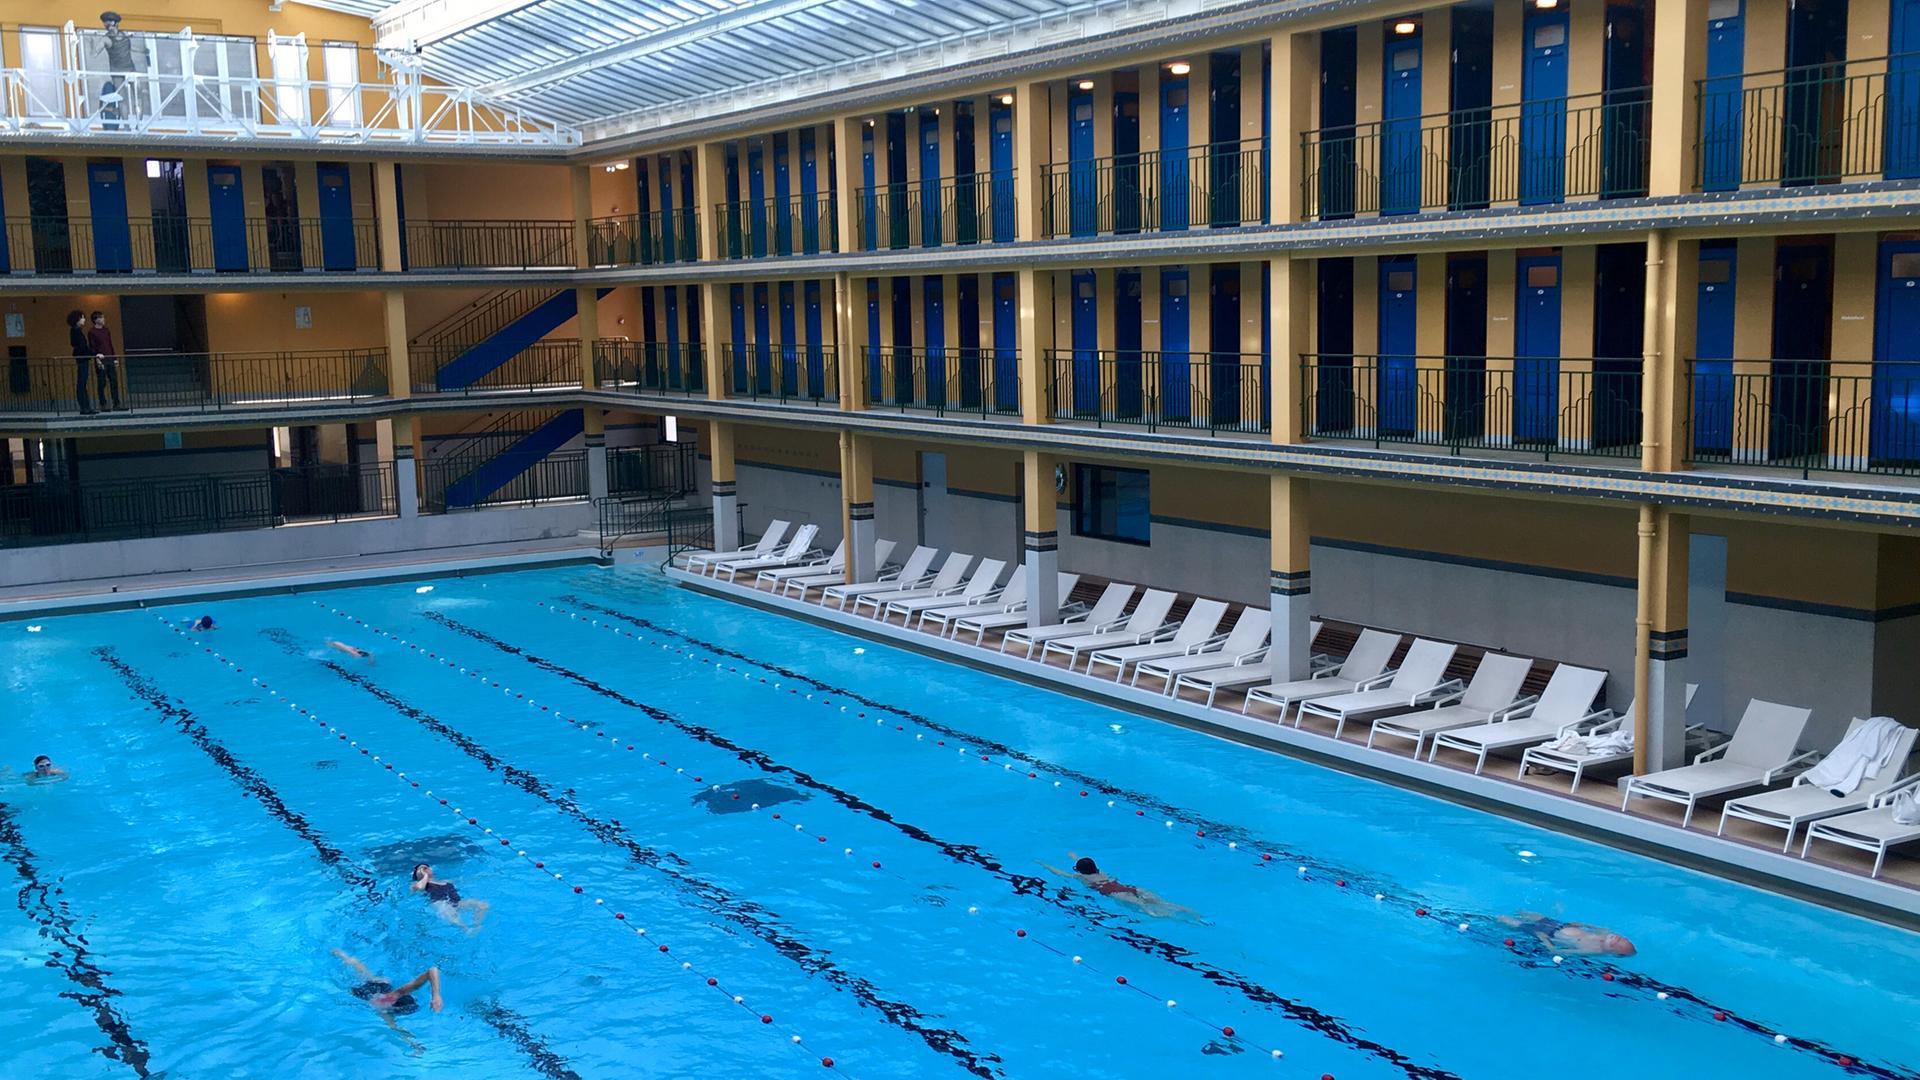 Kunst Im Pariser Schwimmbad Molitor Zdfmediathek